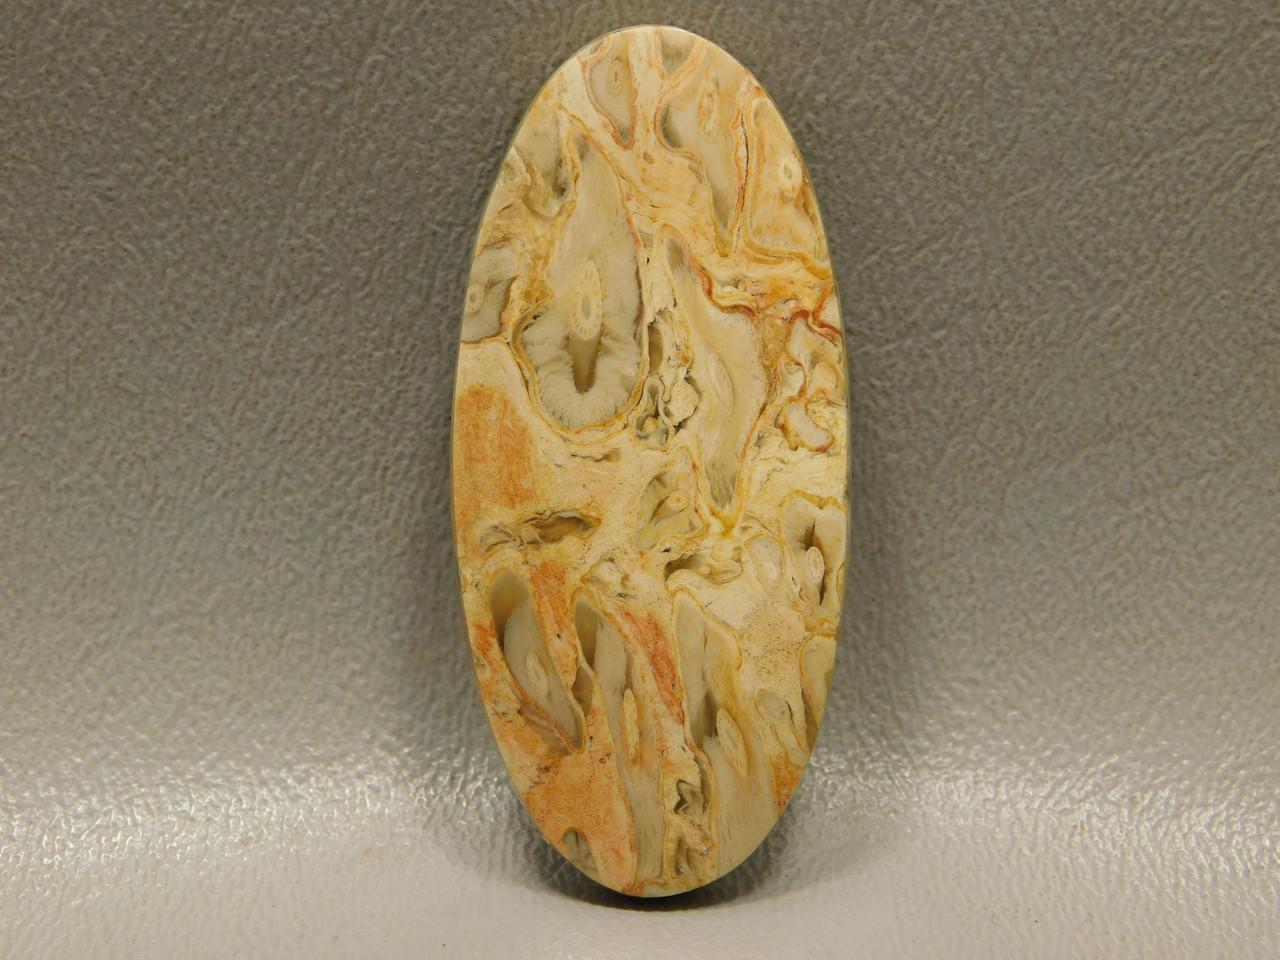 Petrified Palm Wood Fossilized Cabochon Stone Indonesia #10